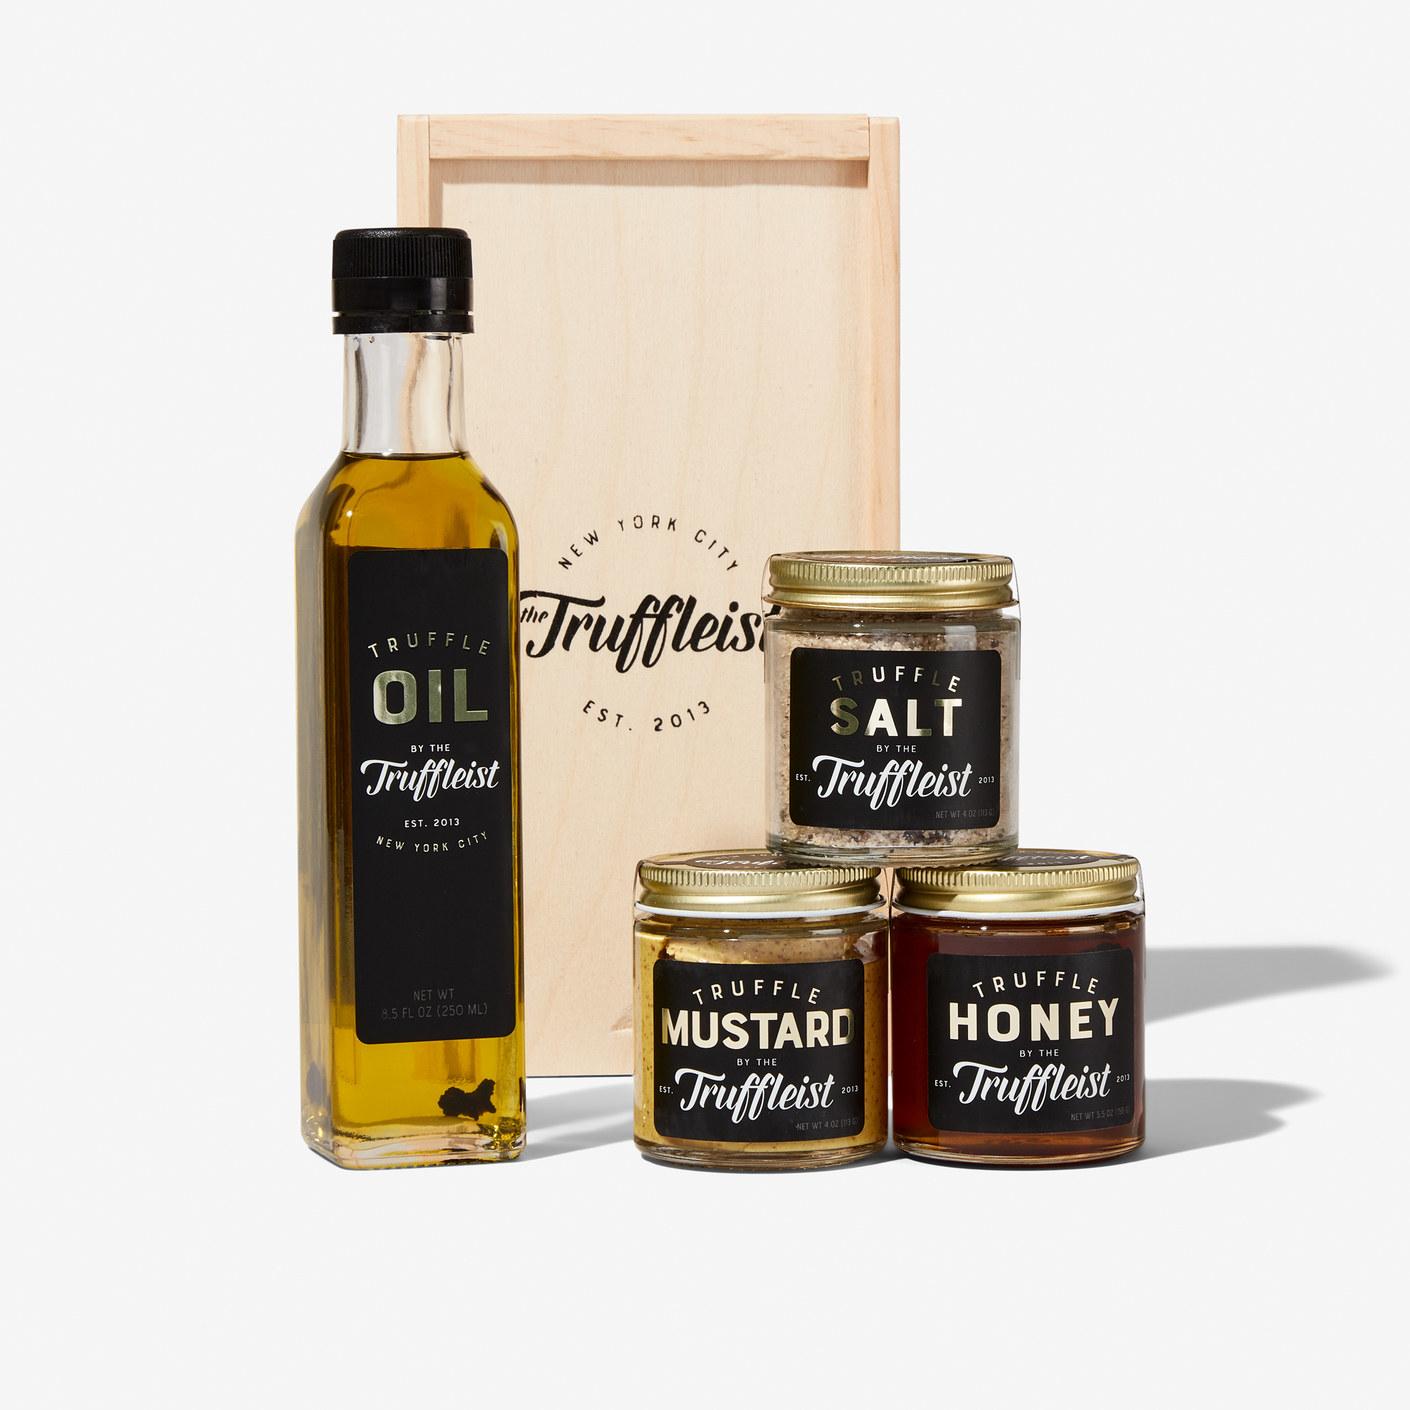 Bottles of truffle oil, truffle mustard, truffle salt and truffle honey